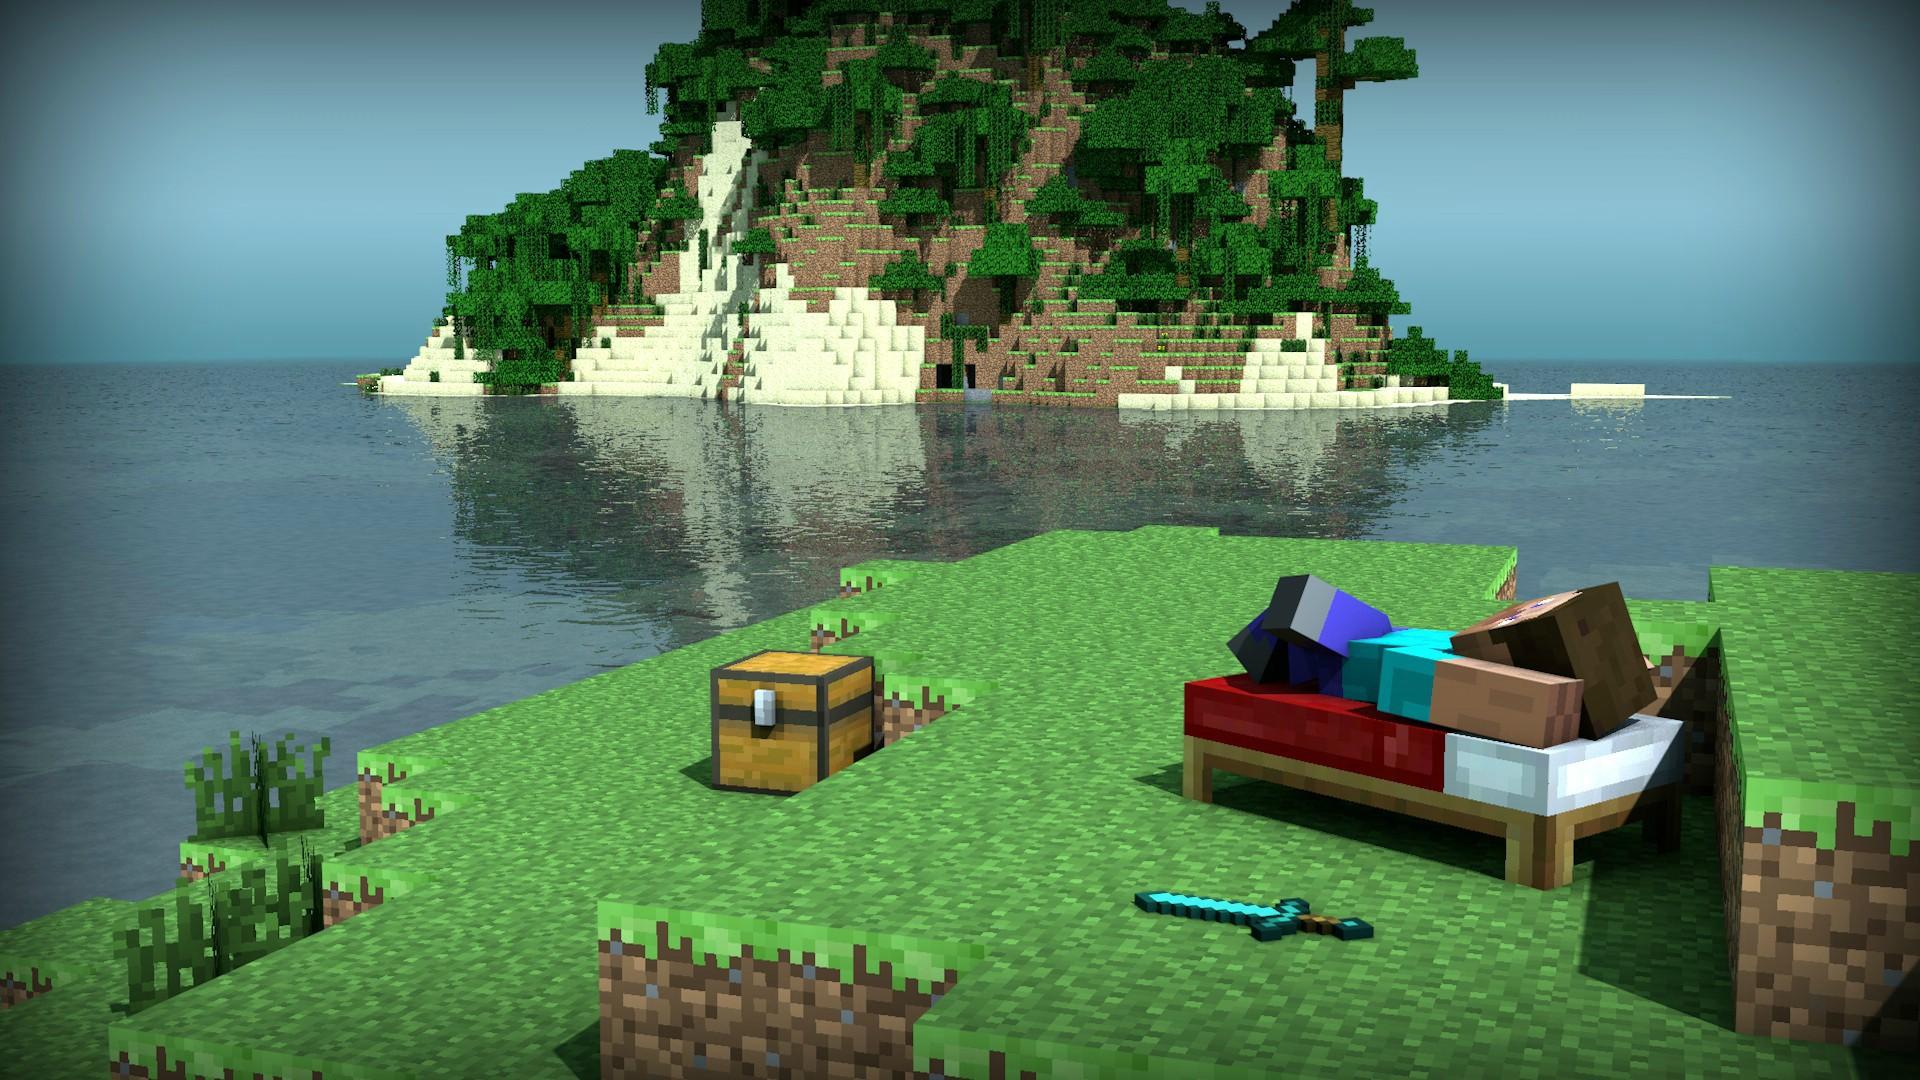 Relaxing Steve   Minecraft Gallery Wallpaper 31052614 1920x1080